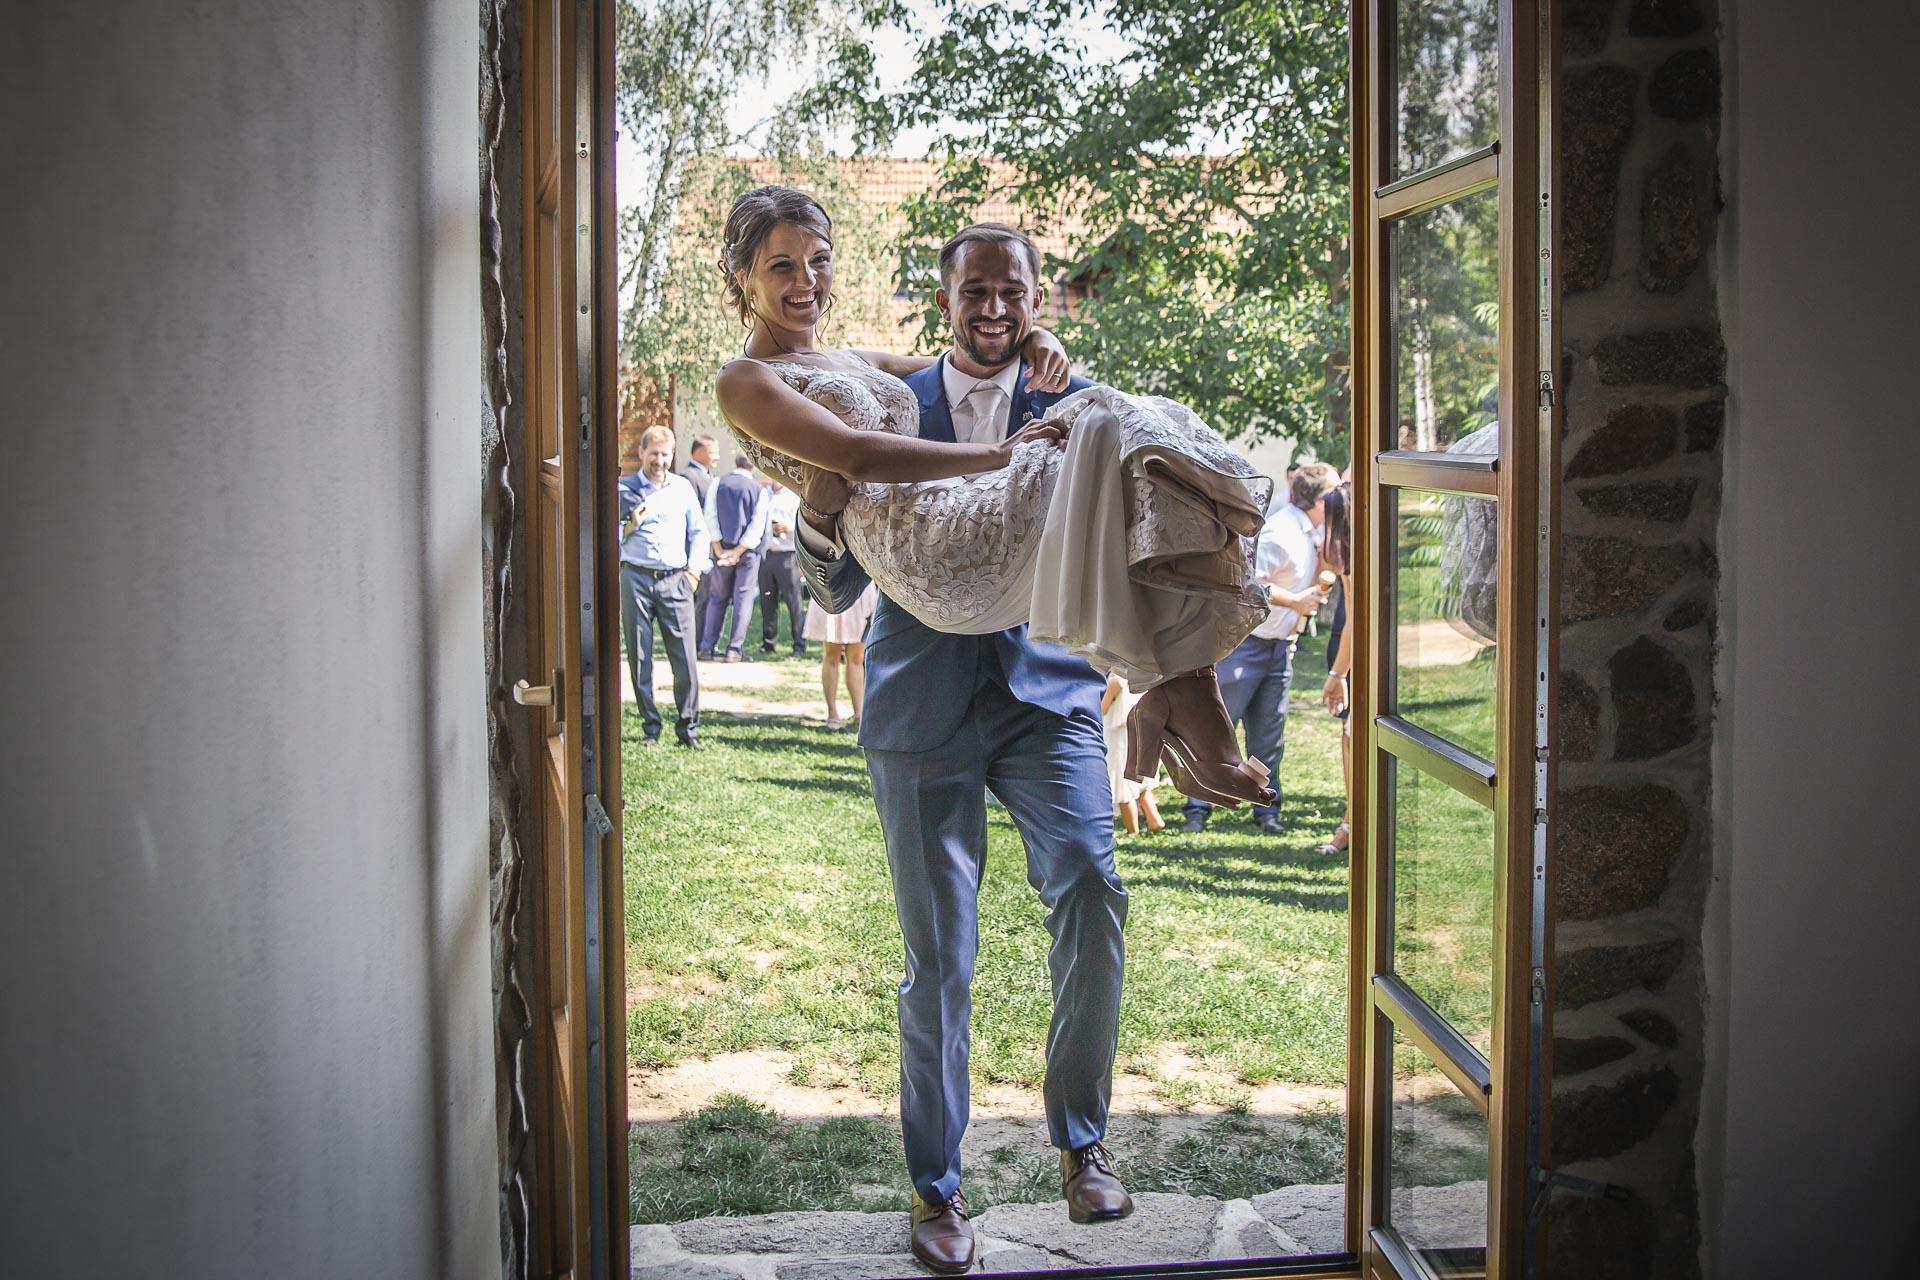 svatební-fotograf-wedding-svatebni-video-orlík-vltava-kostel-statek-stodola-boho-svatba-Beautyfoto-357